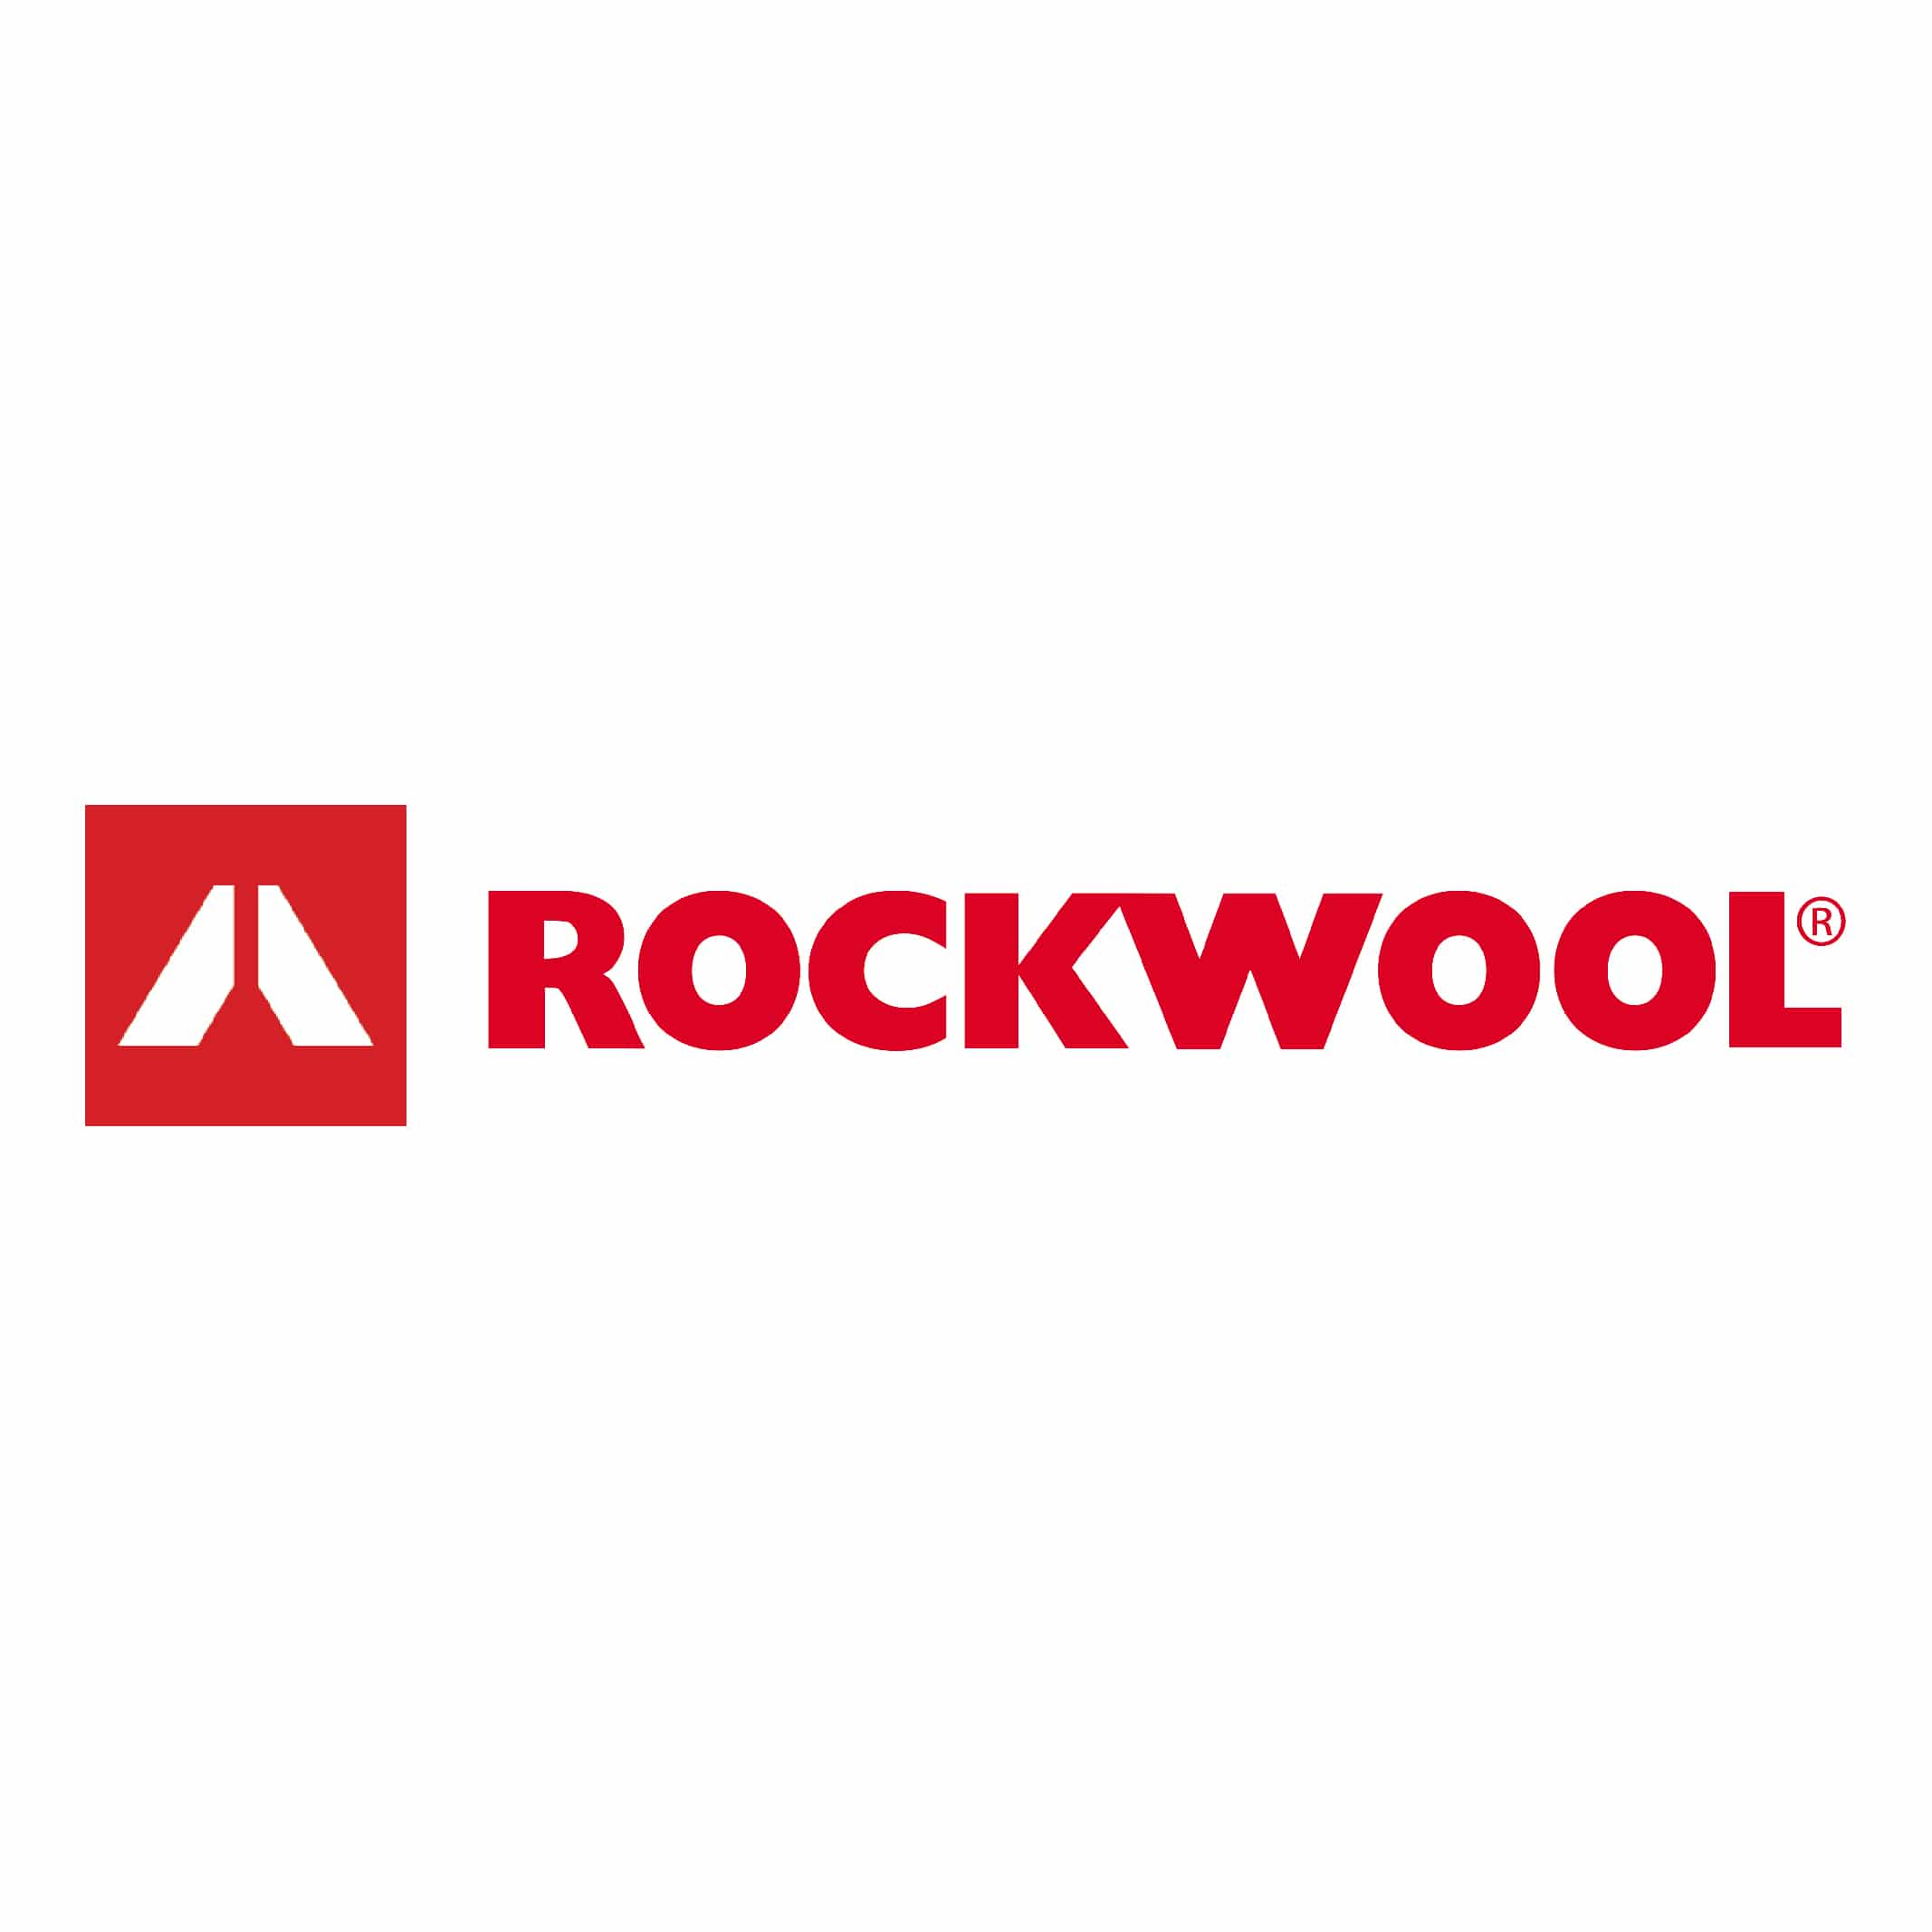 ROCKWOOL (aka Roxul, Inc.)